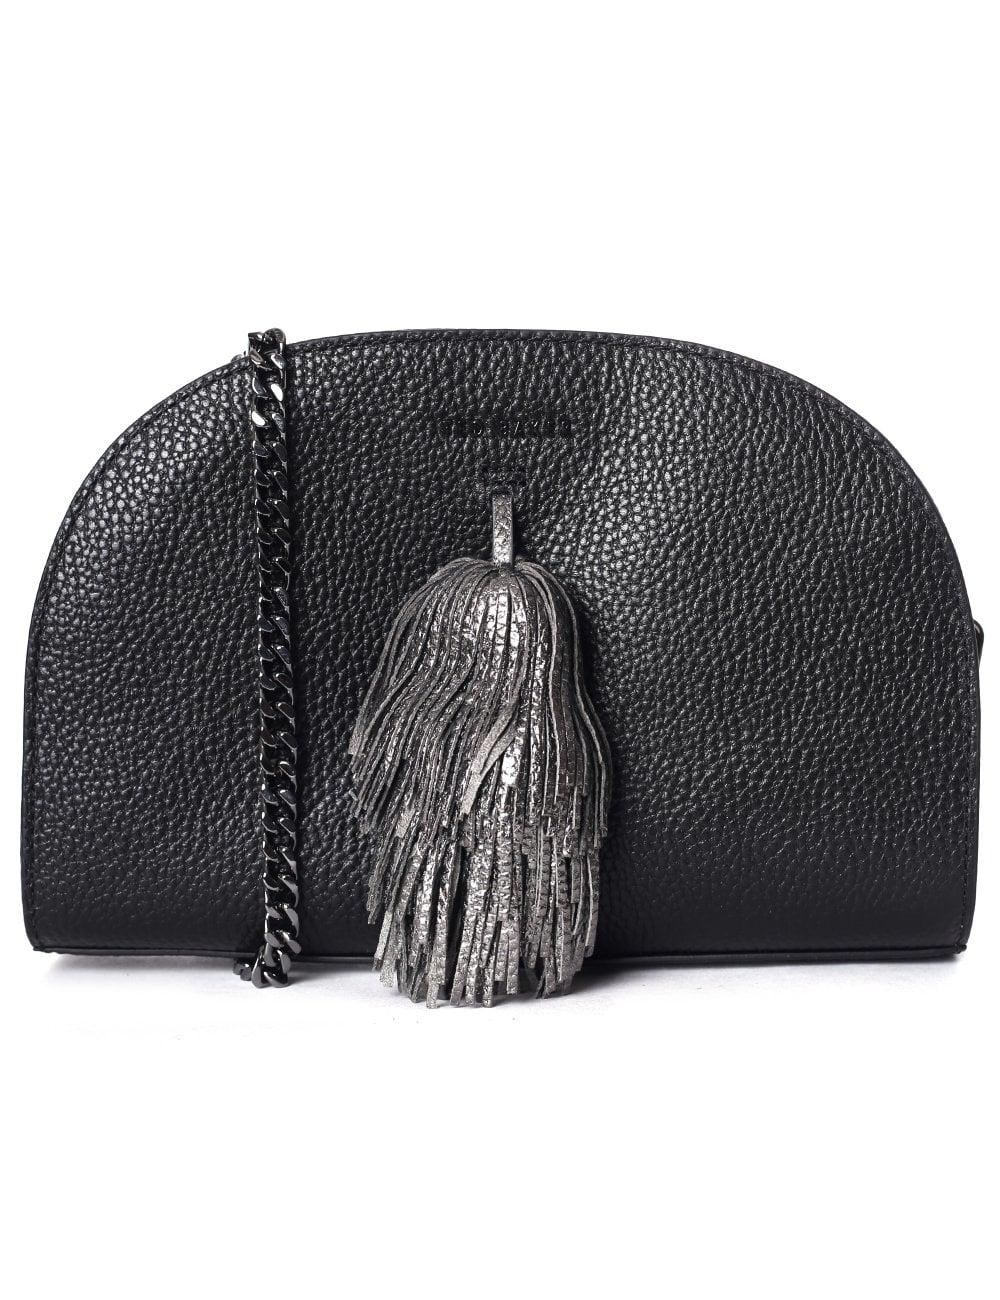 035fe6836 Ted Baker Marry Leather Pom Pom Bag Black